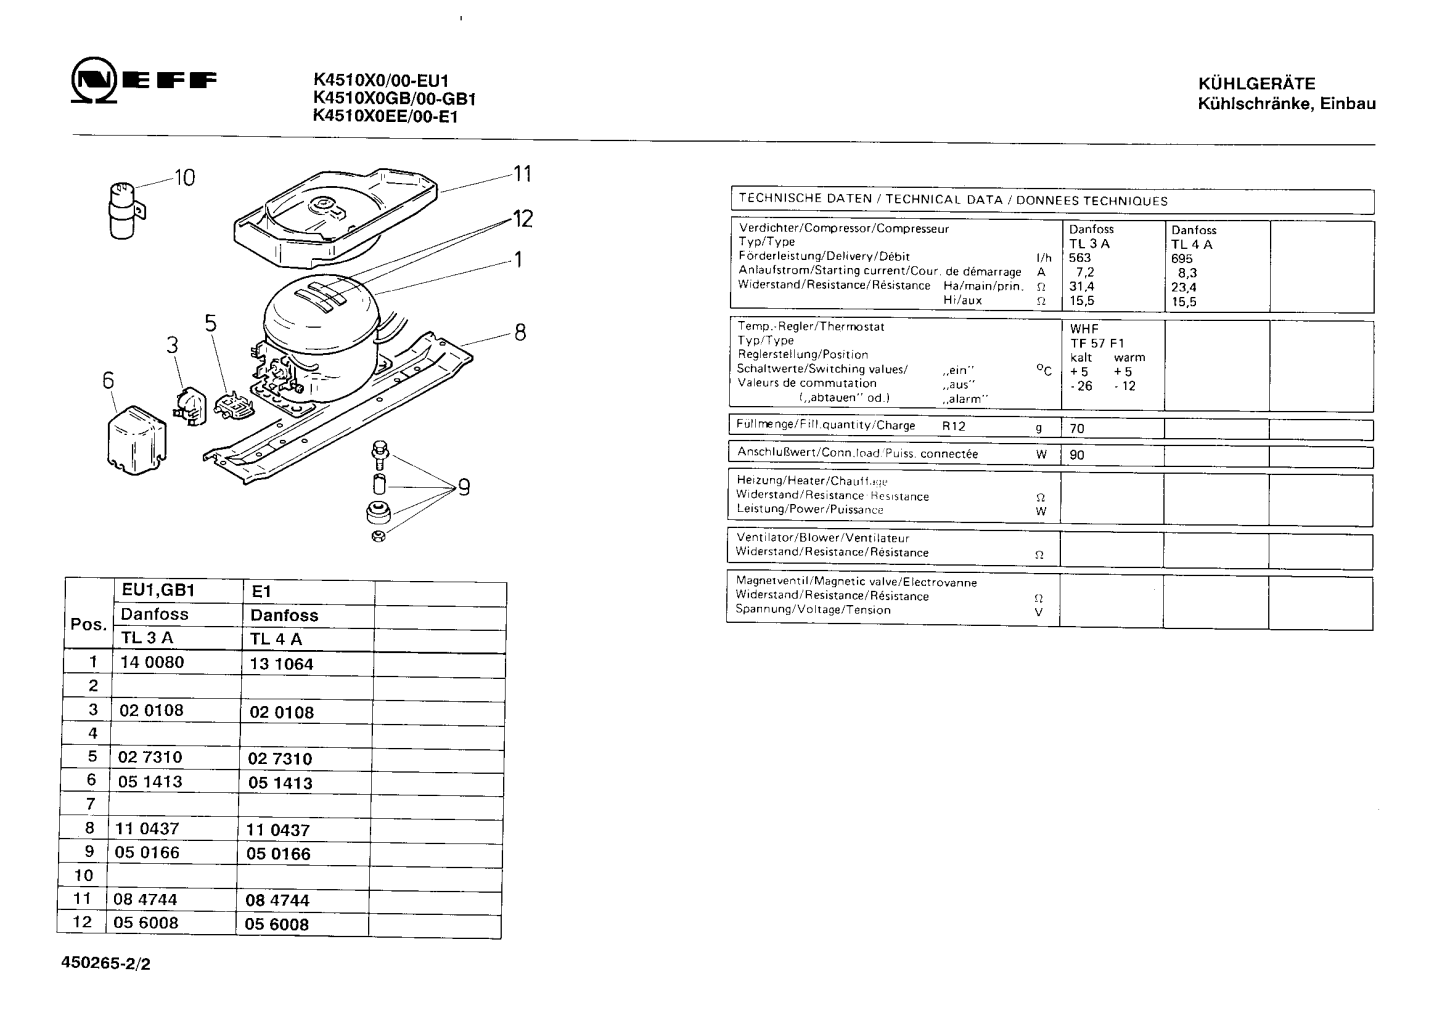 abb vfd ach550 wiring diagrams home furnace diagram wiring